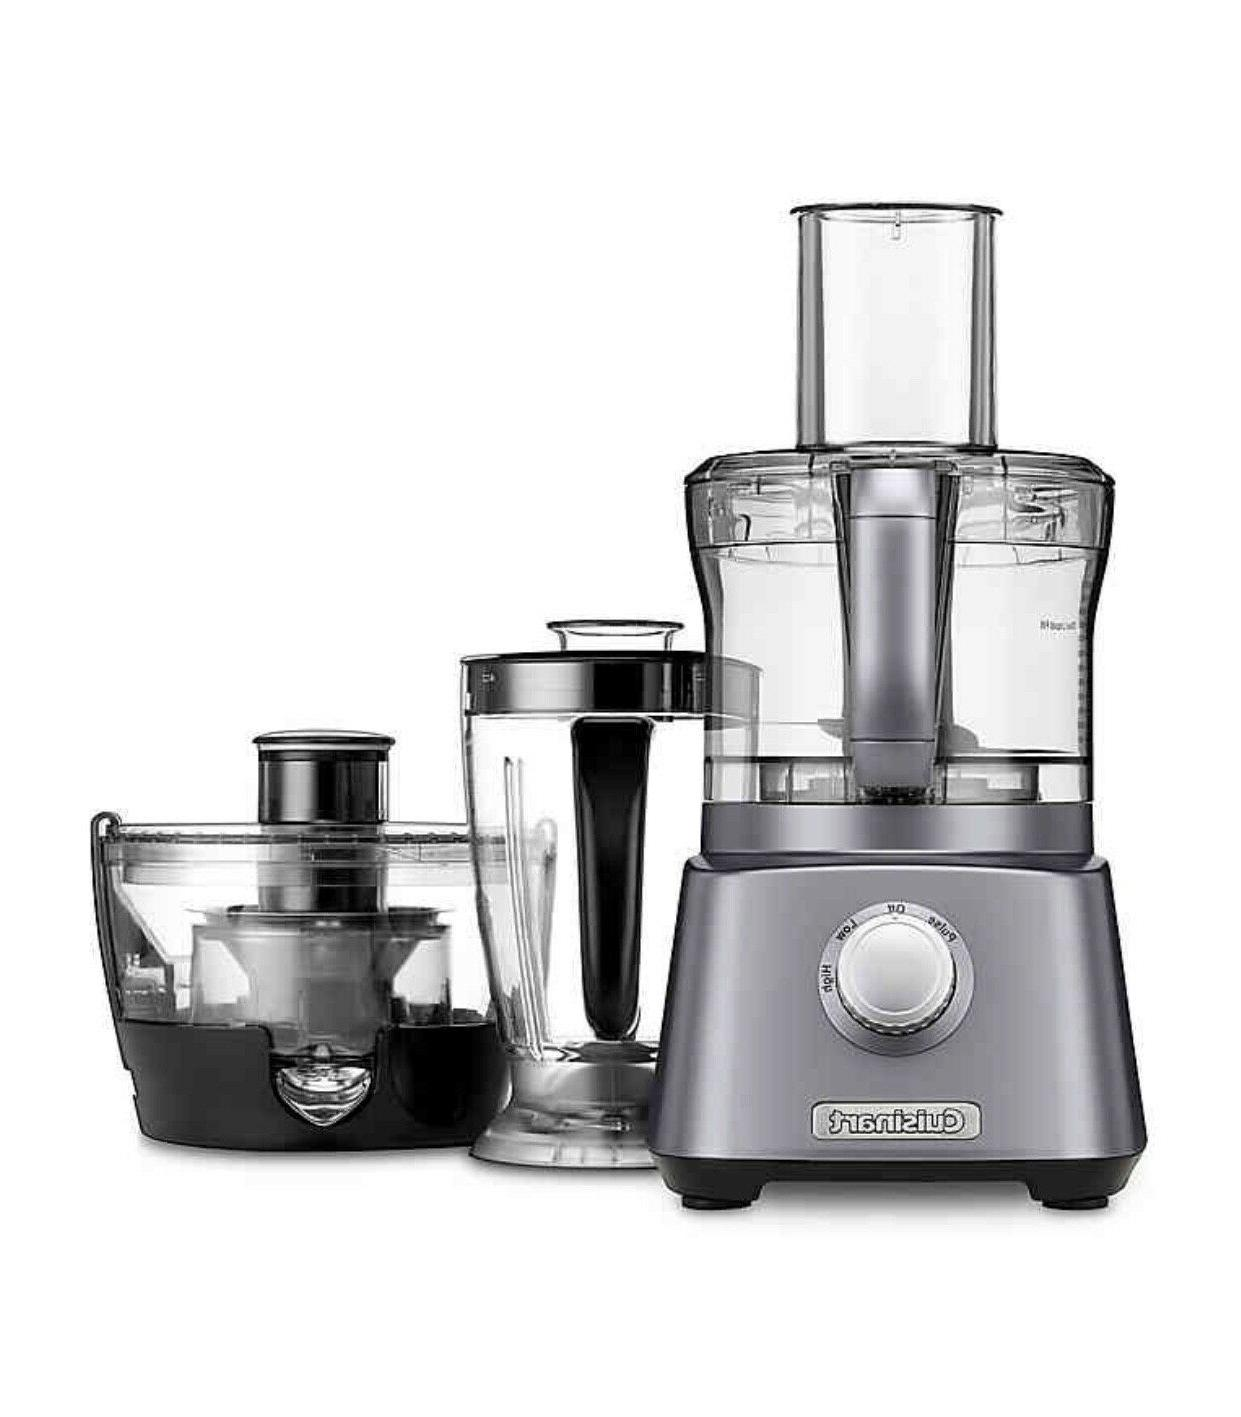 Cuisinart Kitchen Blender, and Processor in Gunmetal